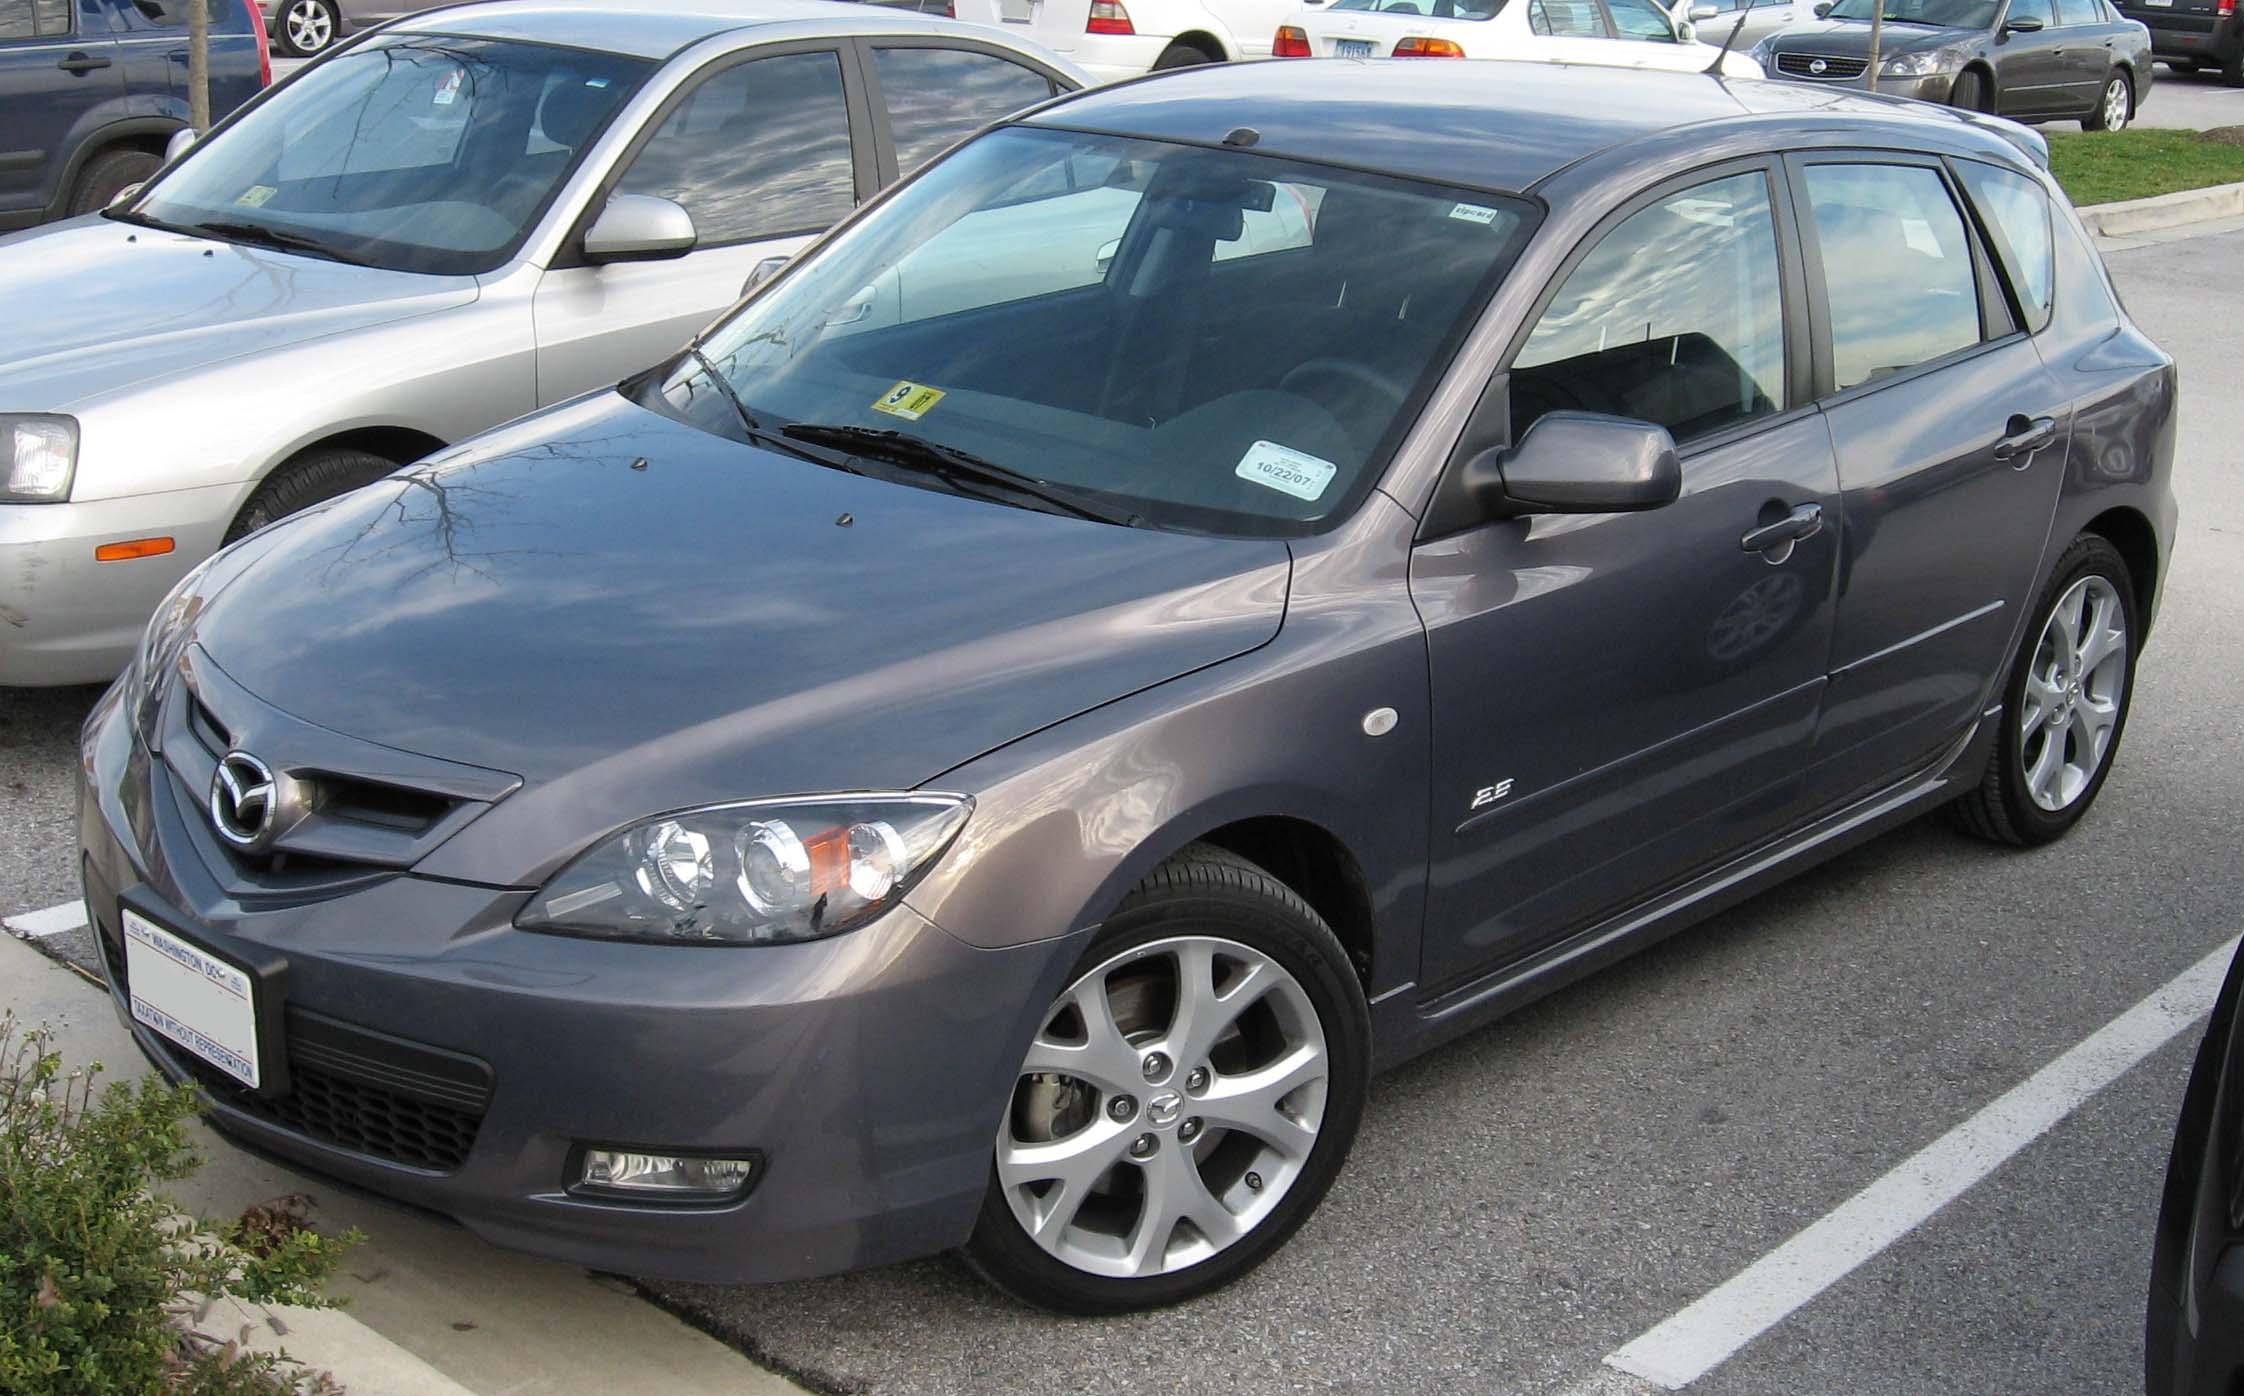 Mazda 3 5 portes US.: fr.academic.ru/dic.nsf/frwiki/1141866